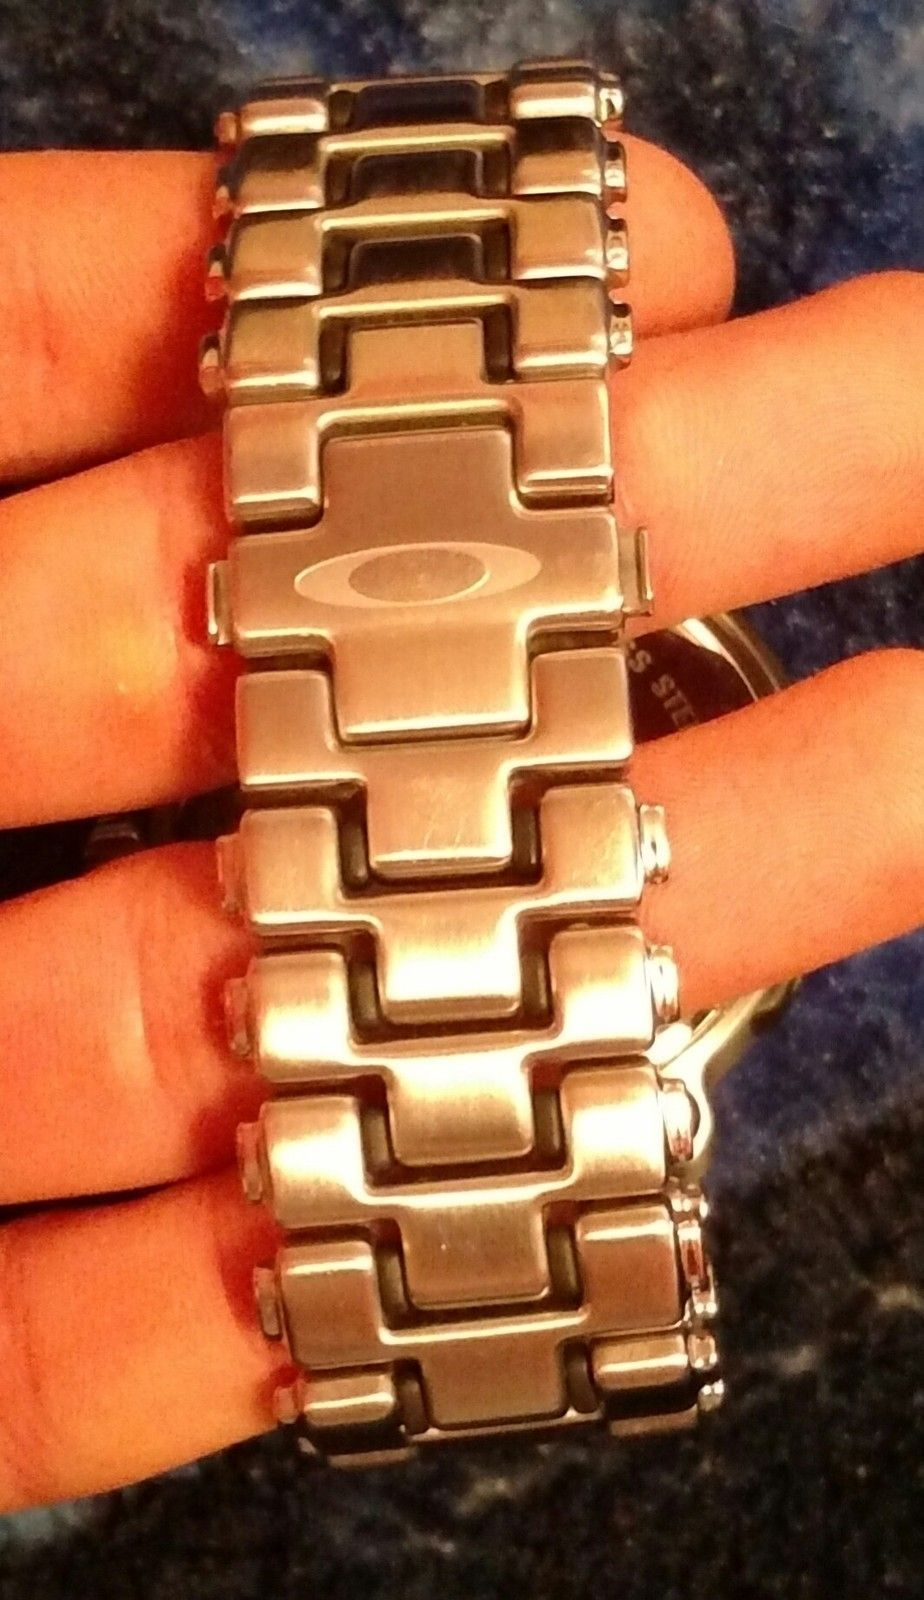 6 Hand Crankcase Watch - uploadfromtaptalk1422976695146.jpg